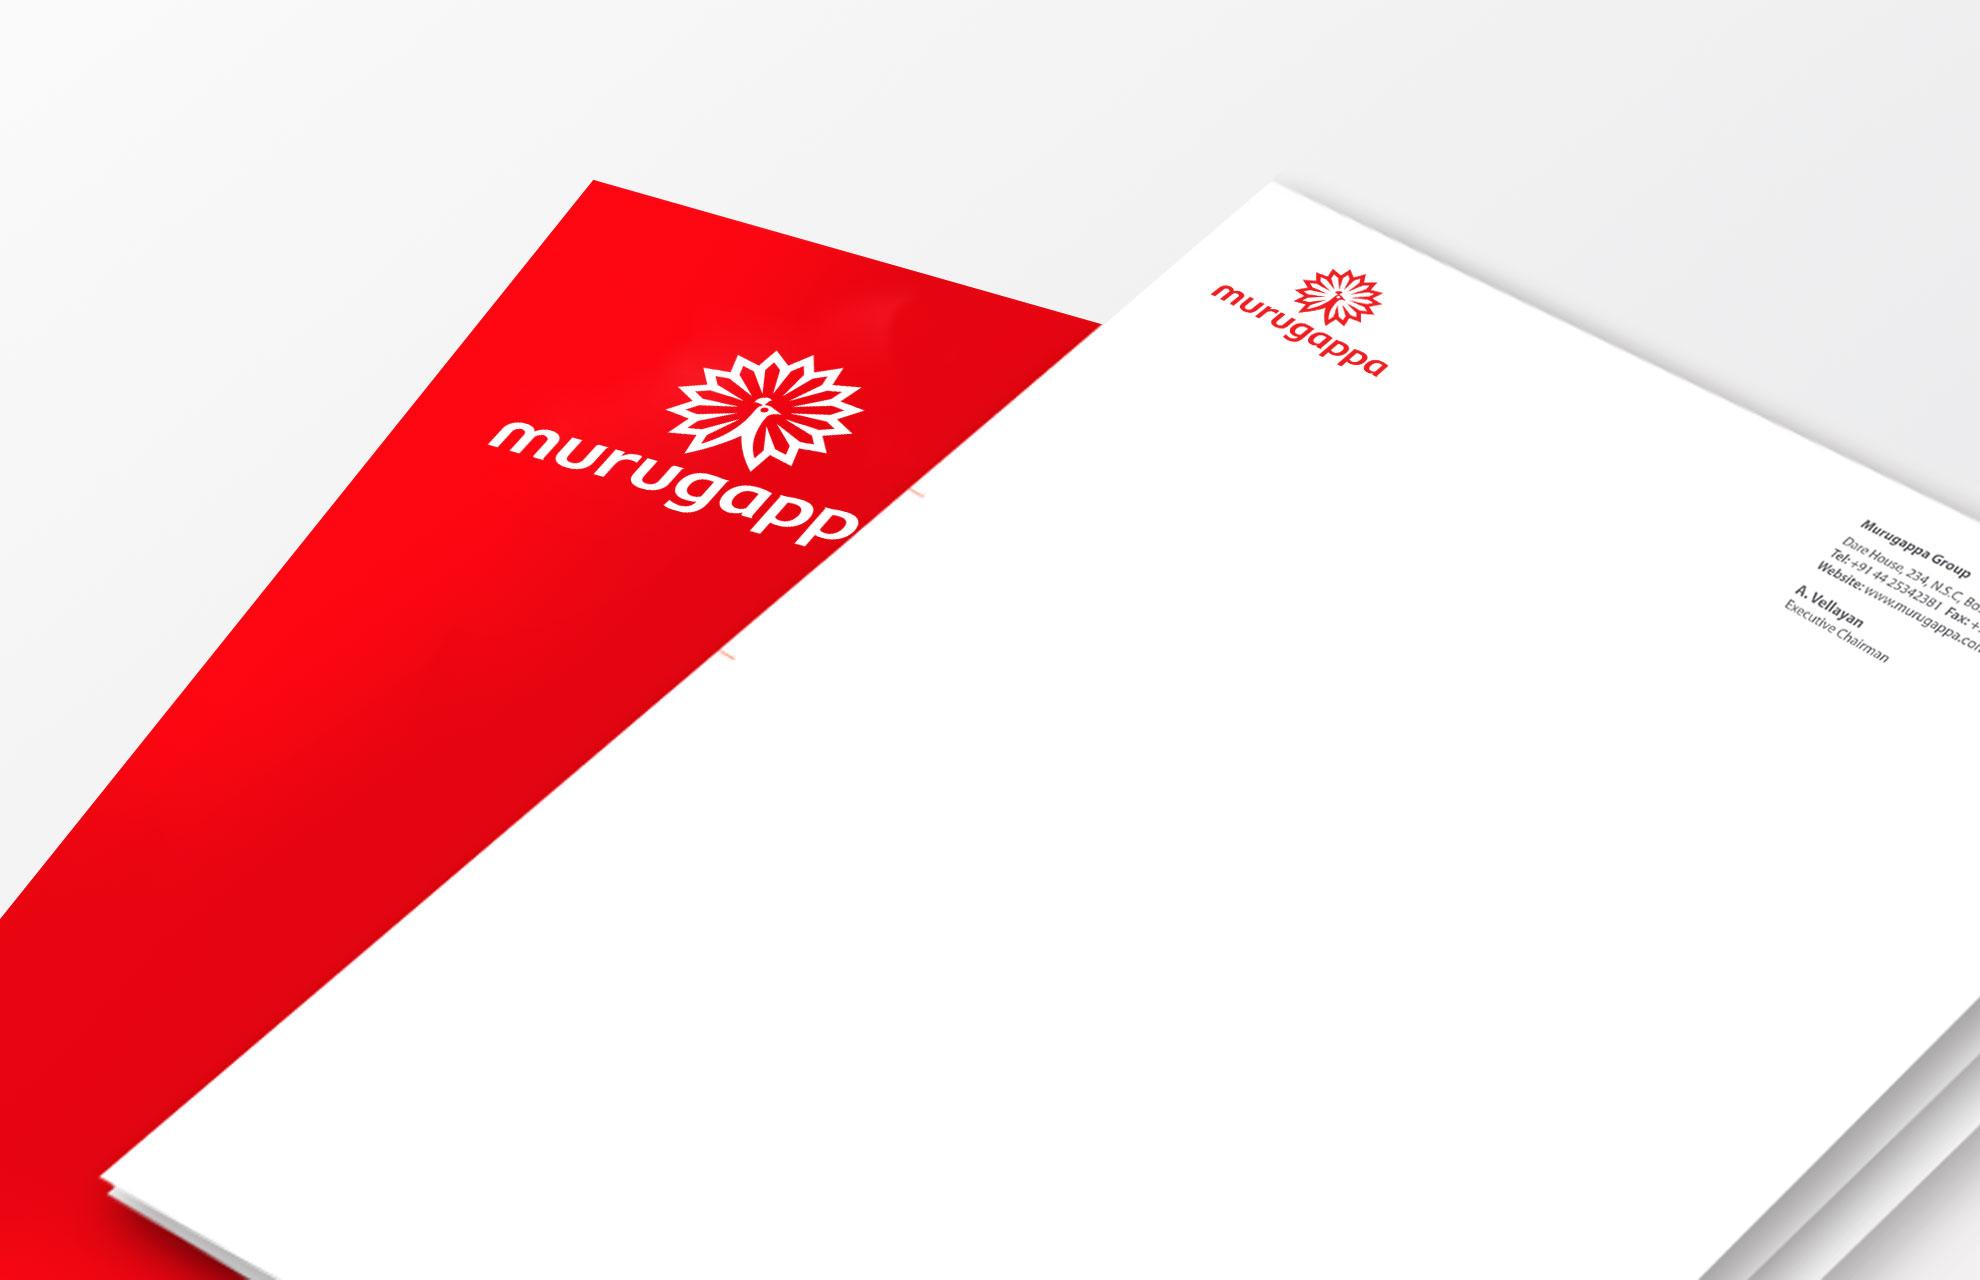 Murugappa-9